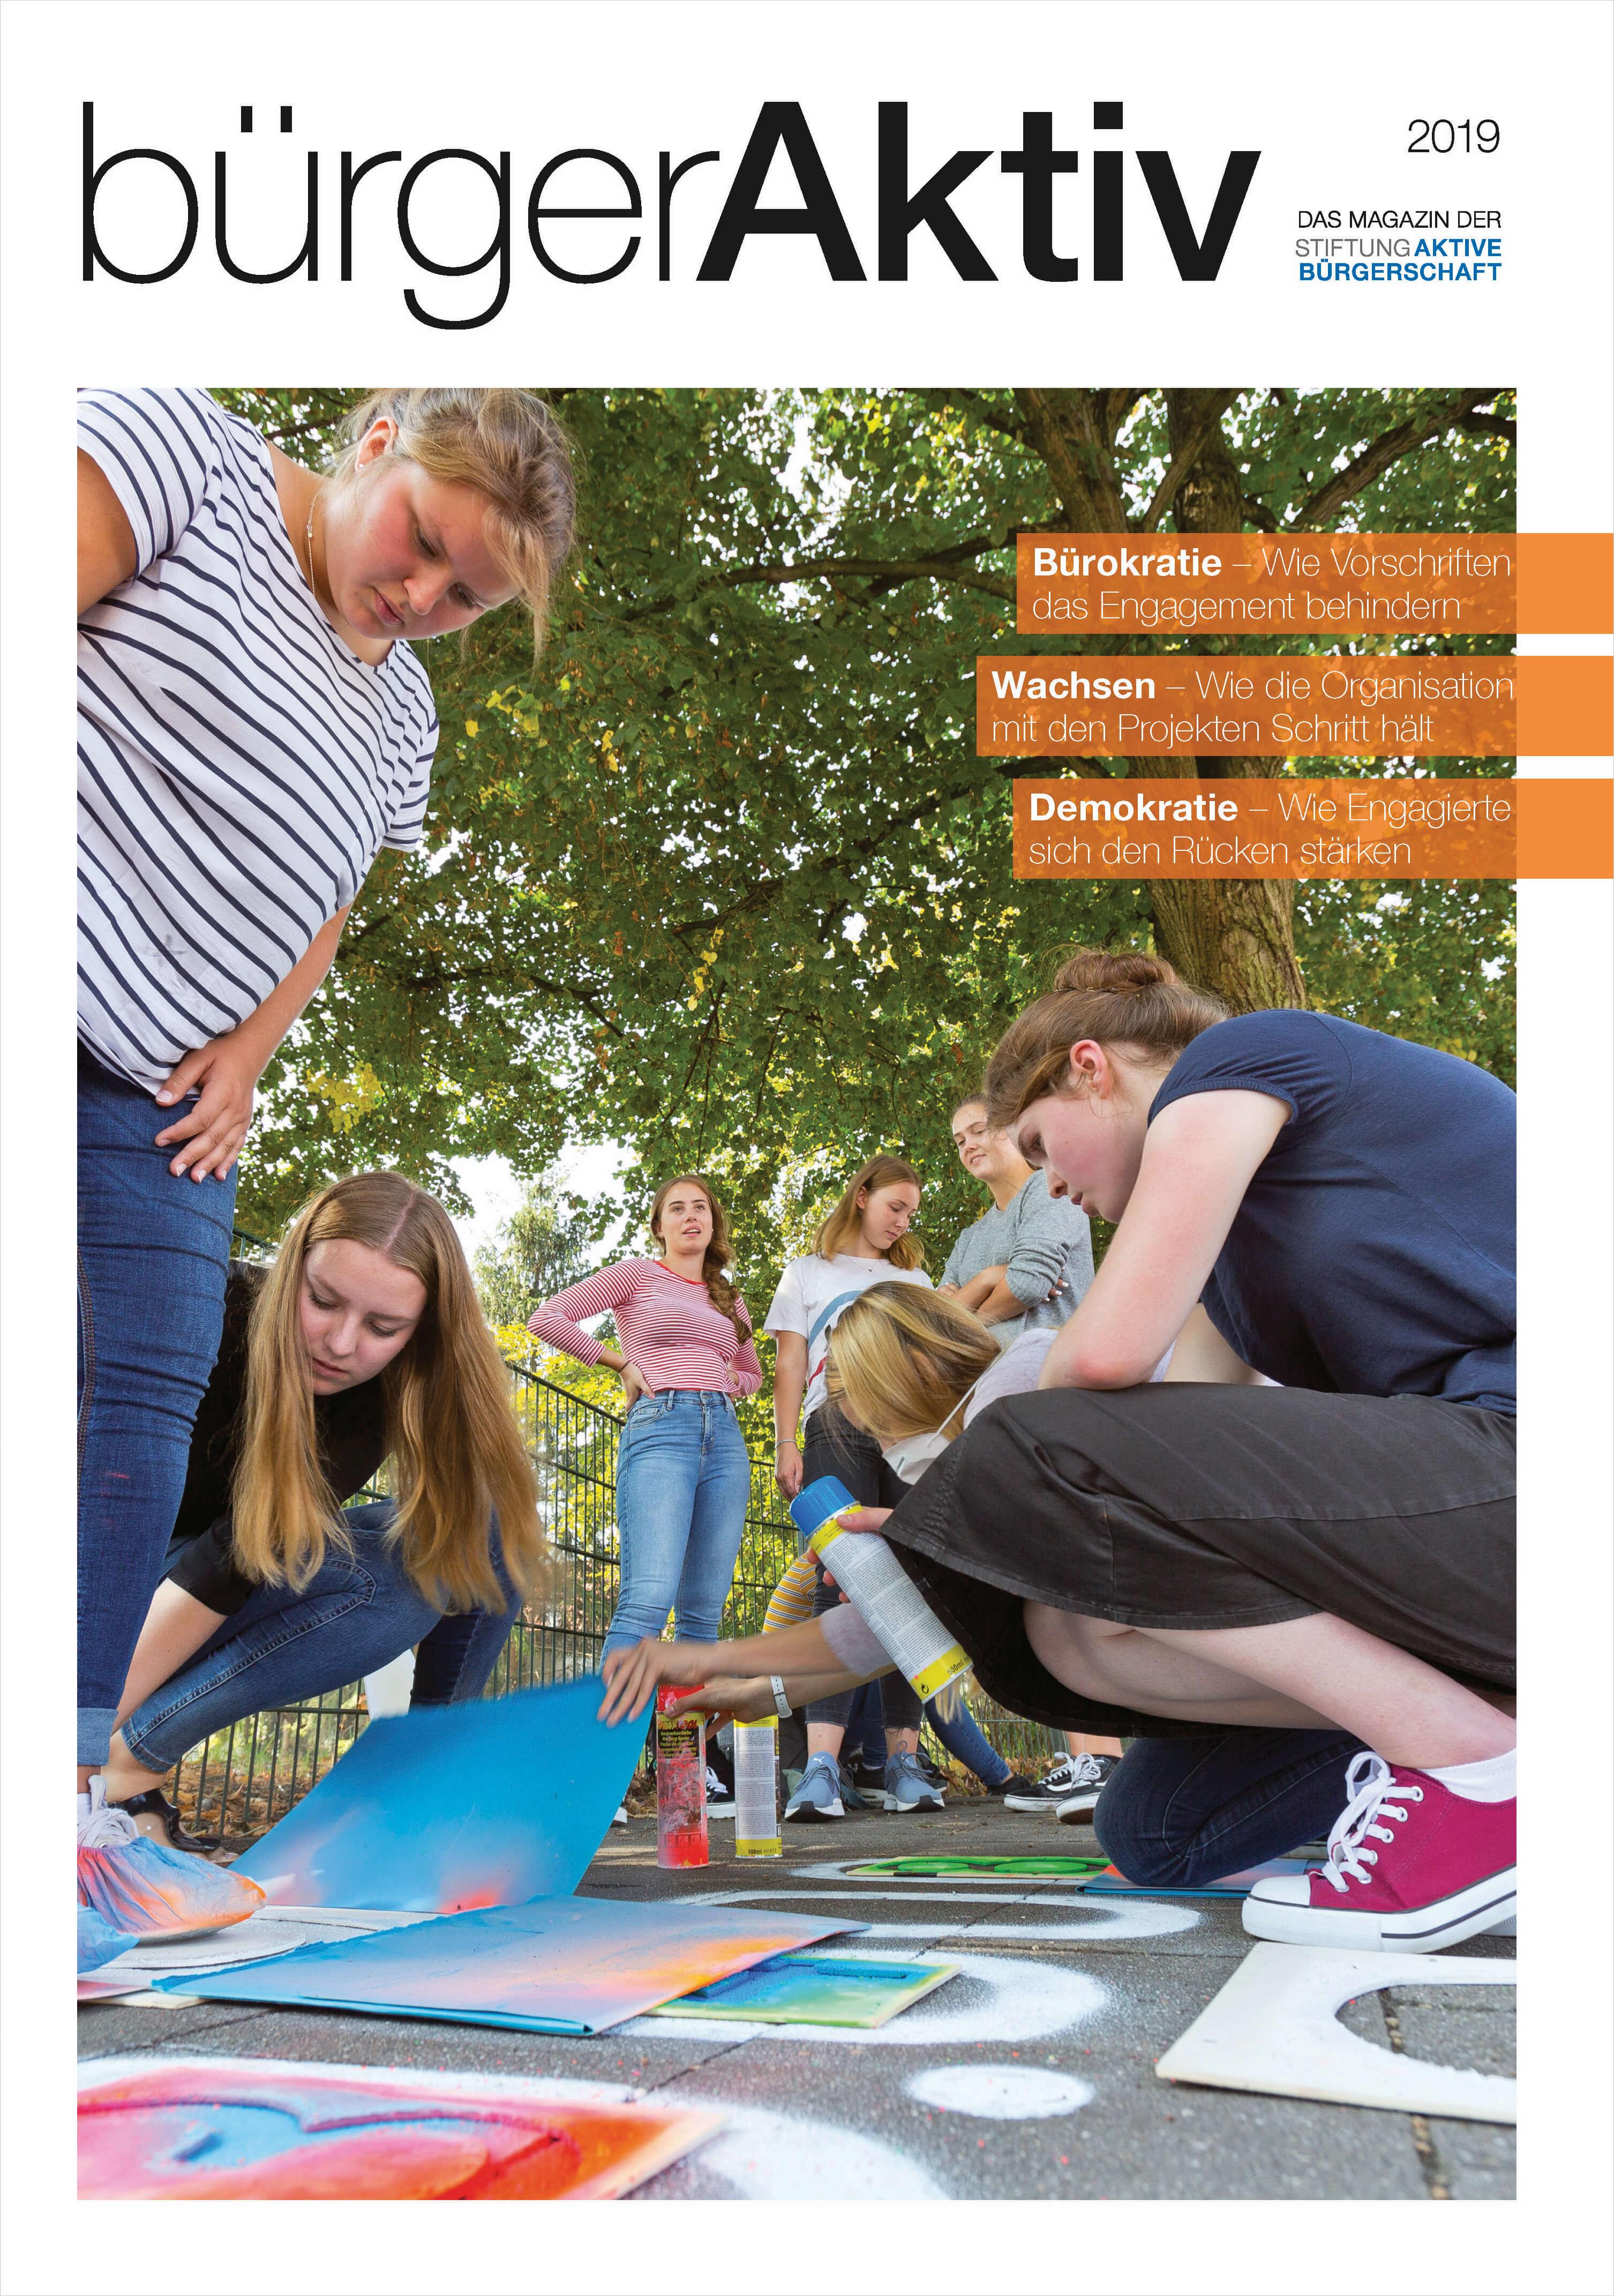 Titelseite bürgerAktiv Magazin 2019